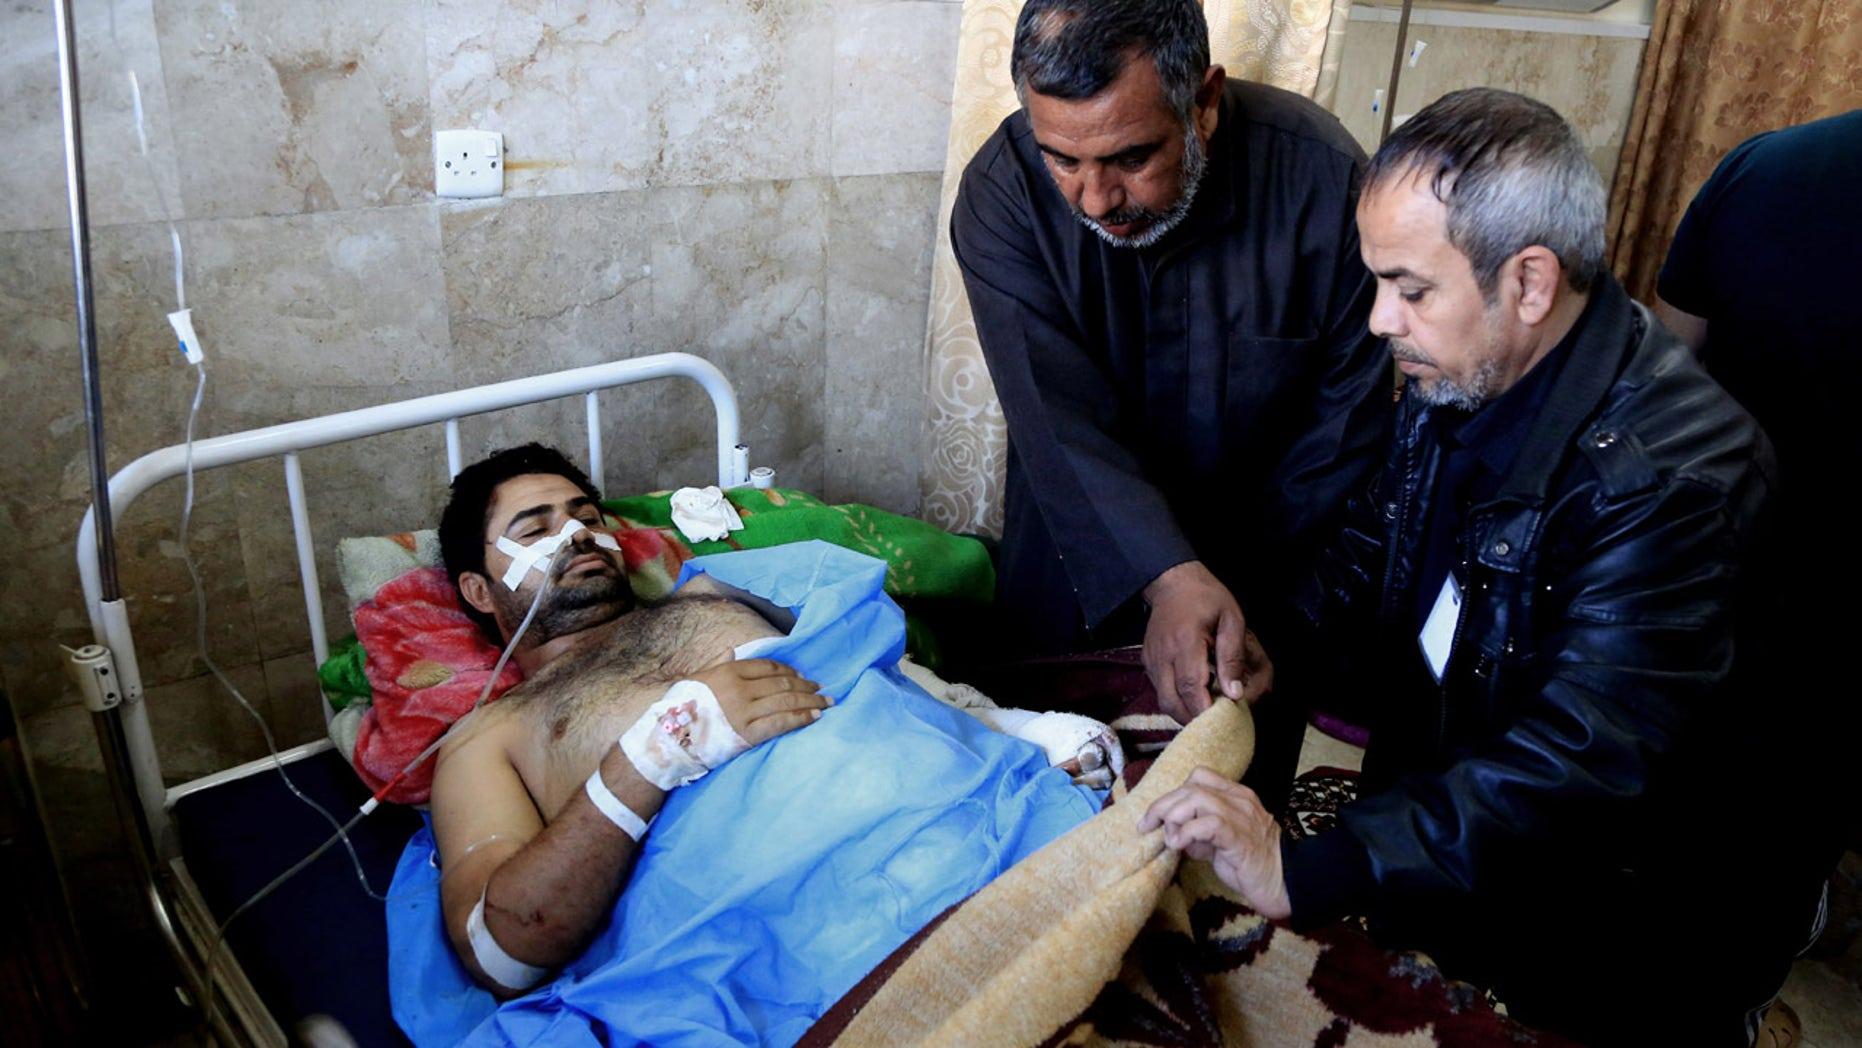 Feb. 29, 2016: An injured victim of bombing attacks receives treatment at the Imam Ali Hospital in Sadr City, Baghdad, Iraq. (AP Photo/Karim Kadim)